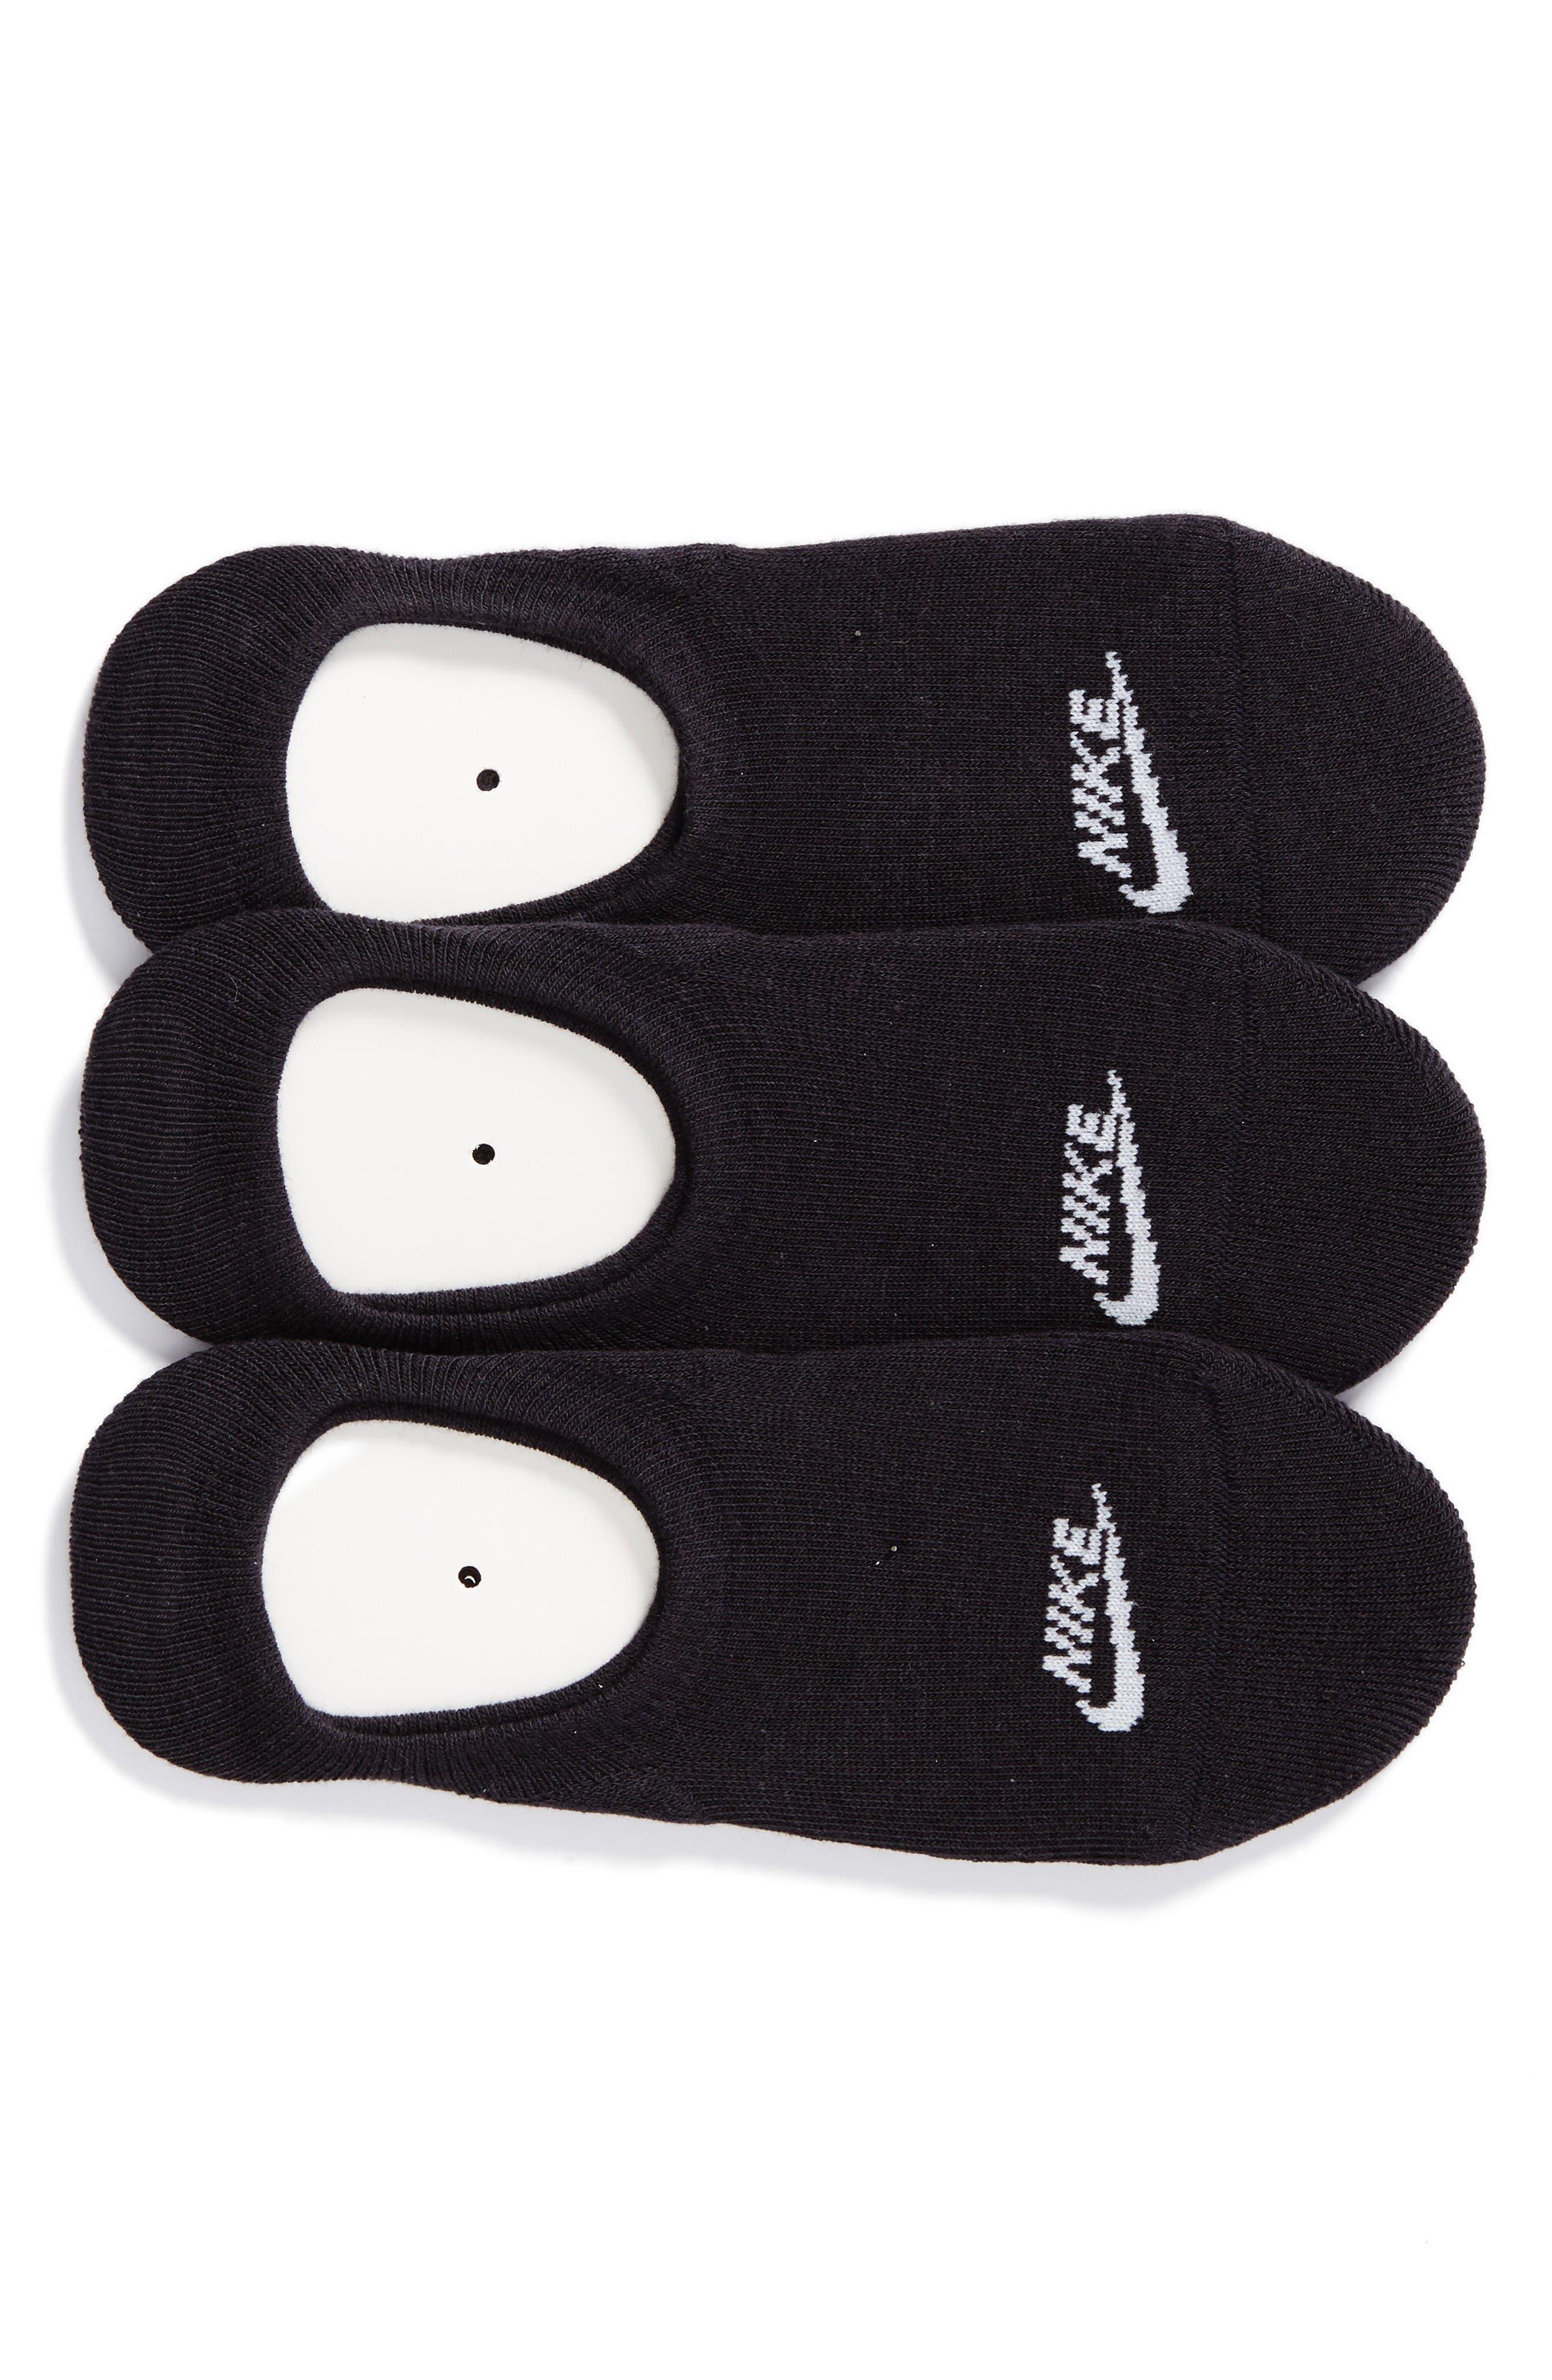 3-Pack No-Show Training Socks,                             Main thumbnail 1, color,                             Black